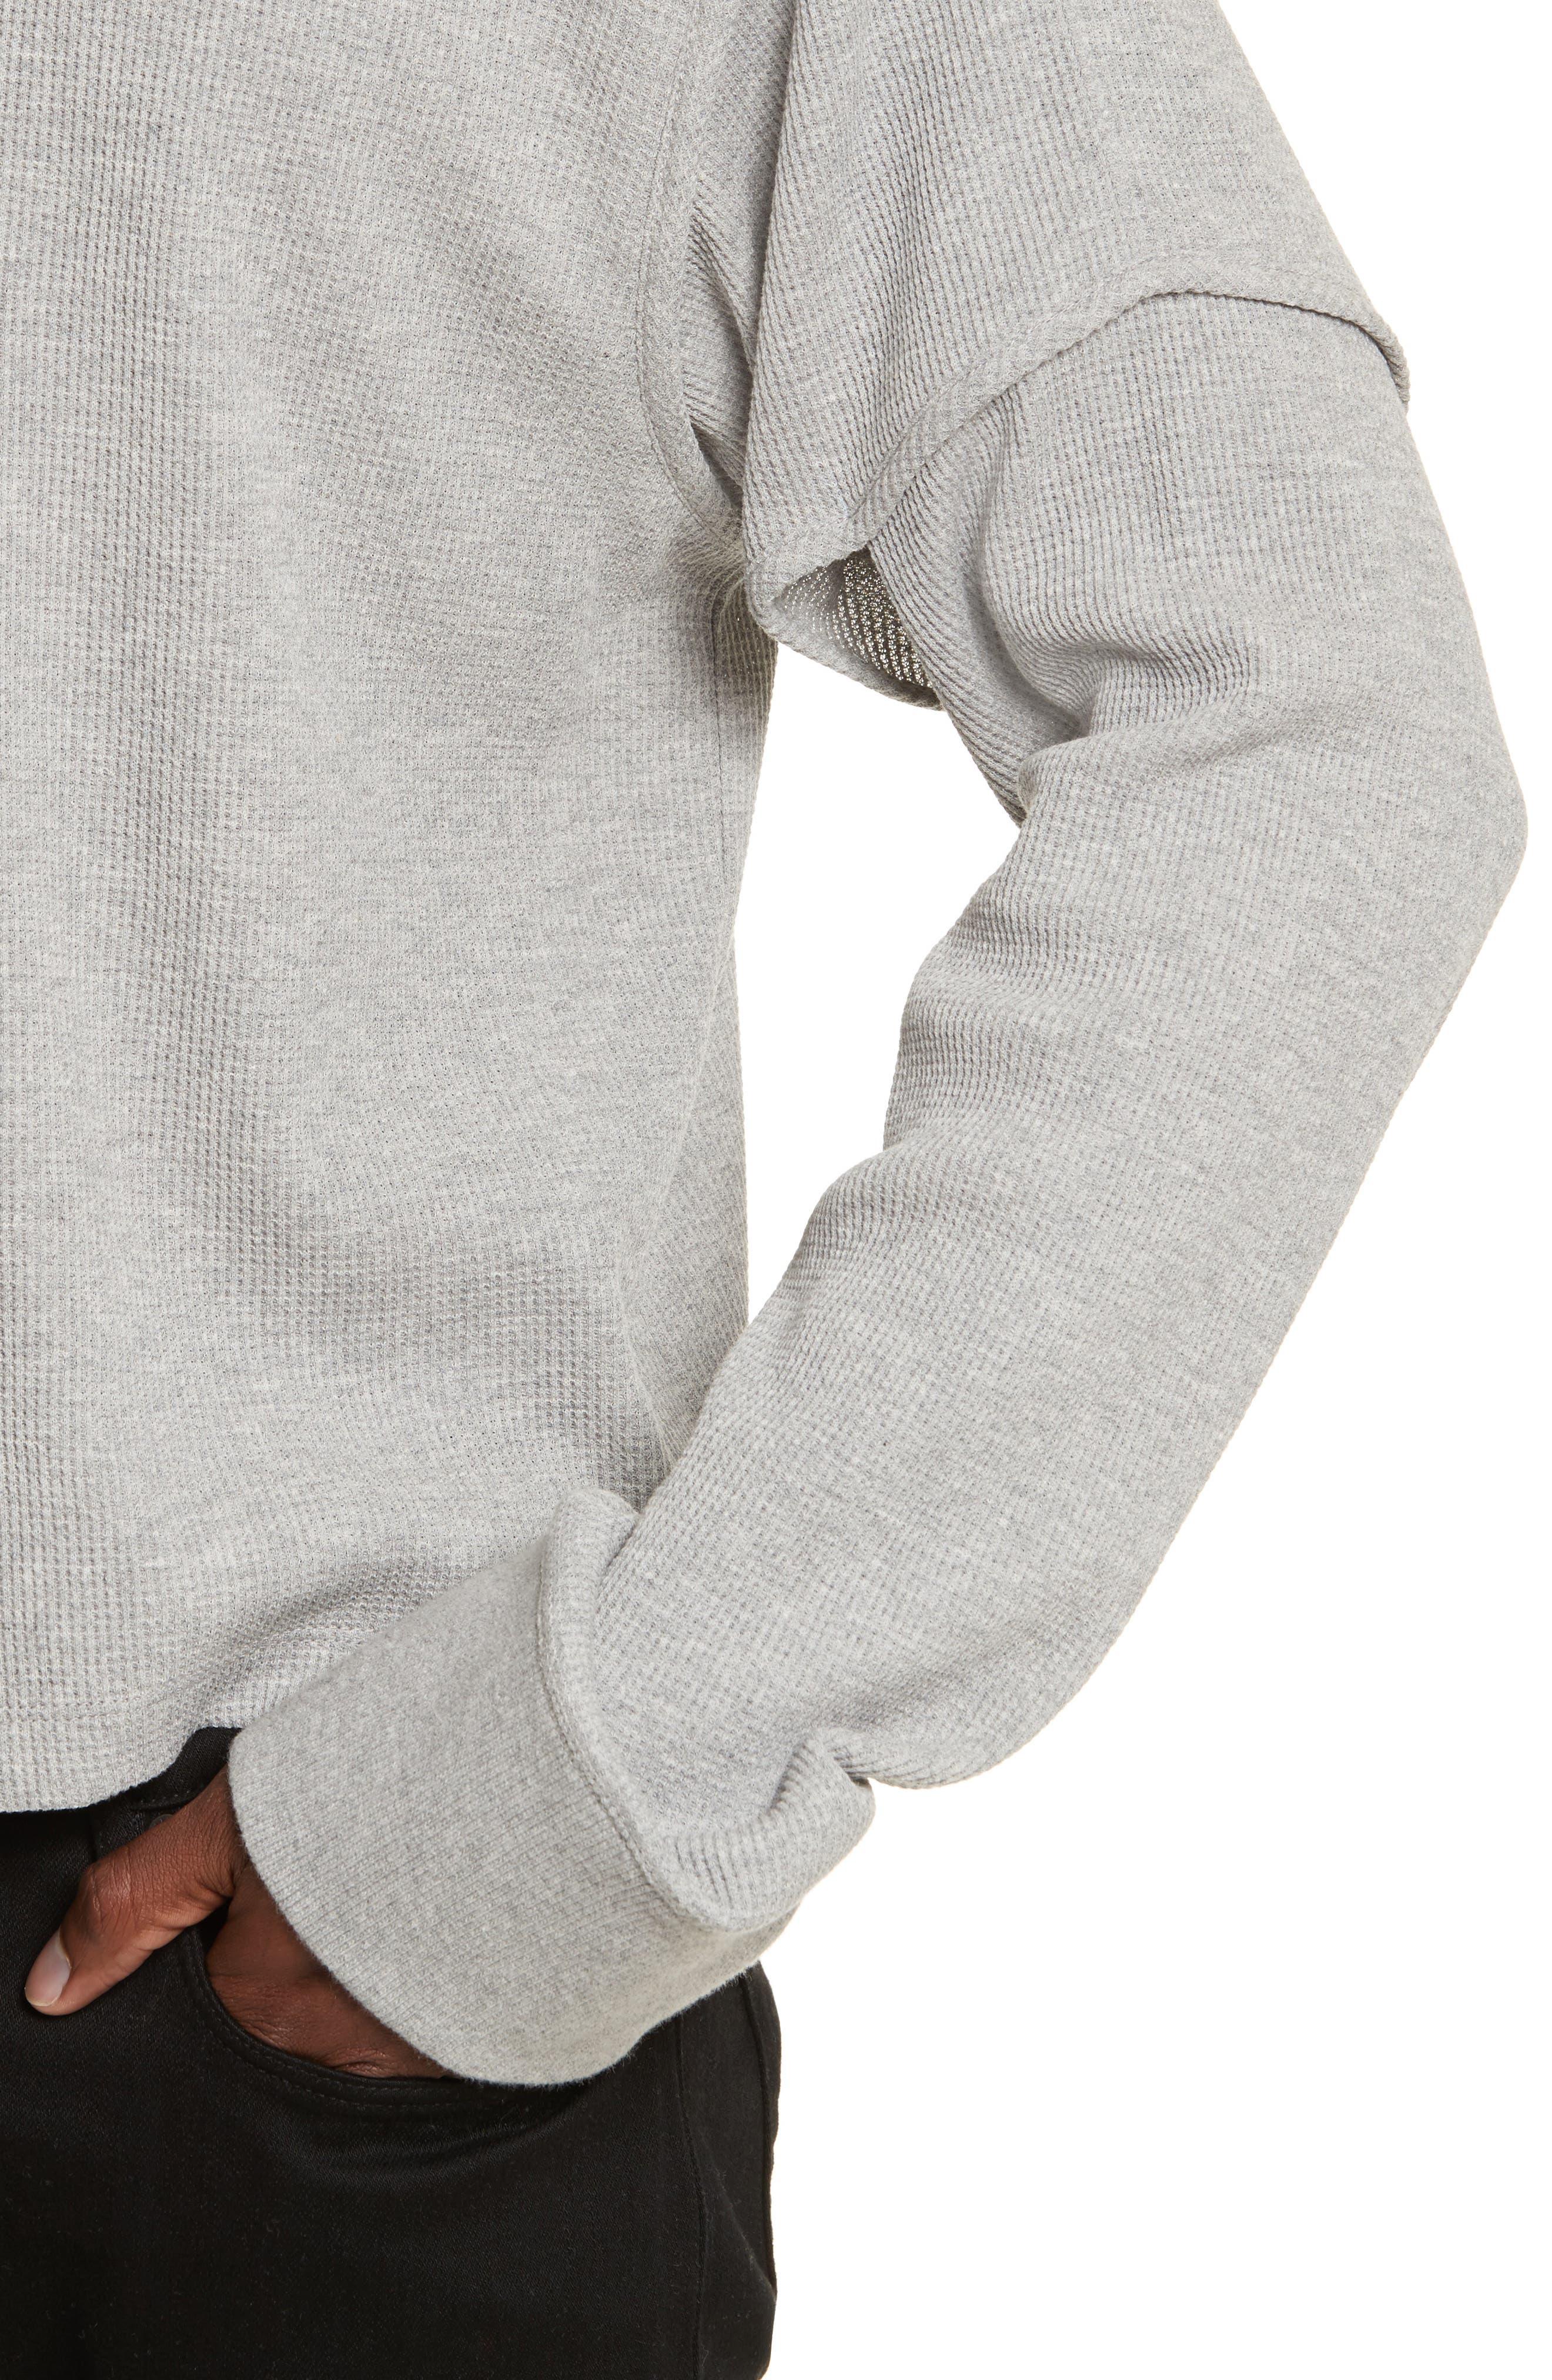 Military Panel Sleeve Thermal Shirt,                             Alternate thumbnail 4, color,                             Grey Melange